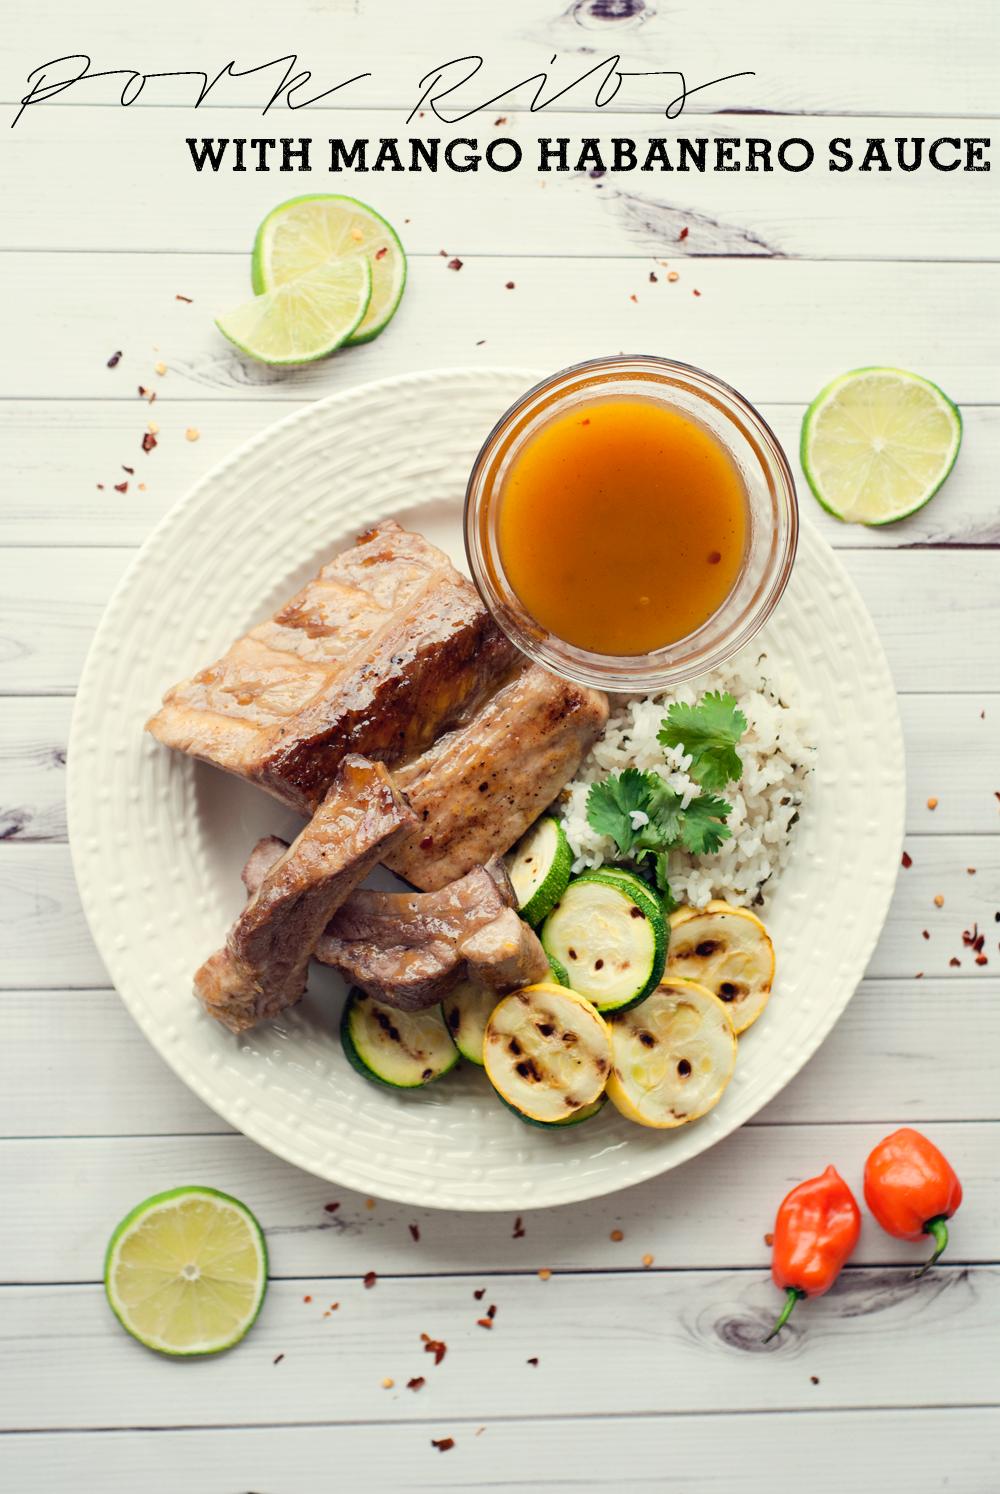 Pork Ribs with Mango Habanero Sauce